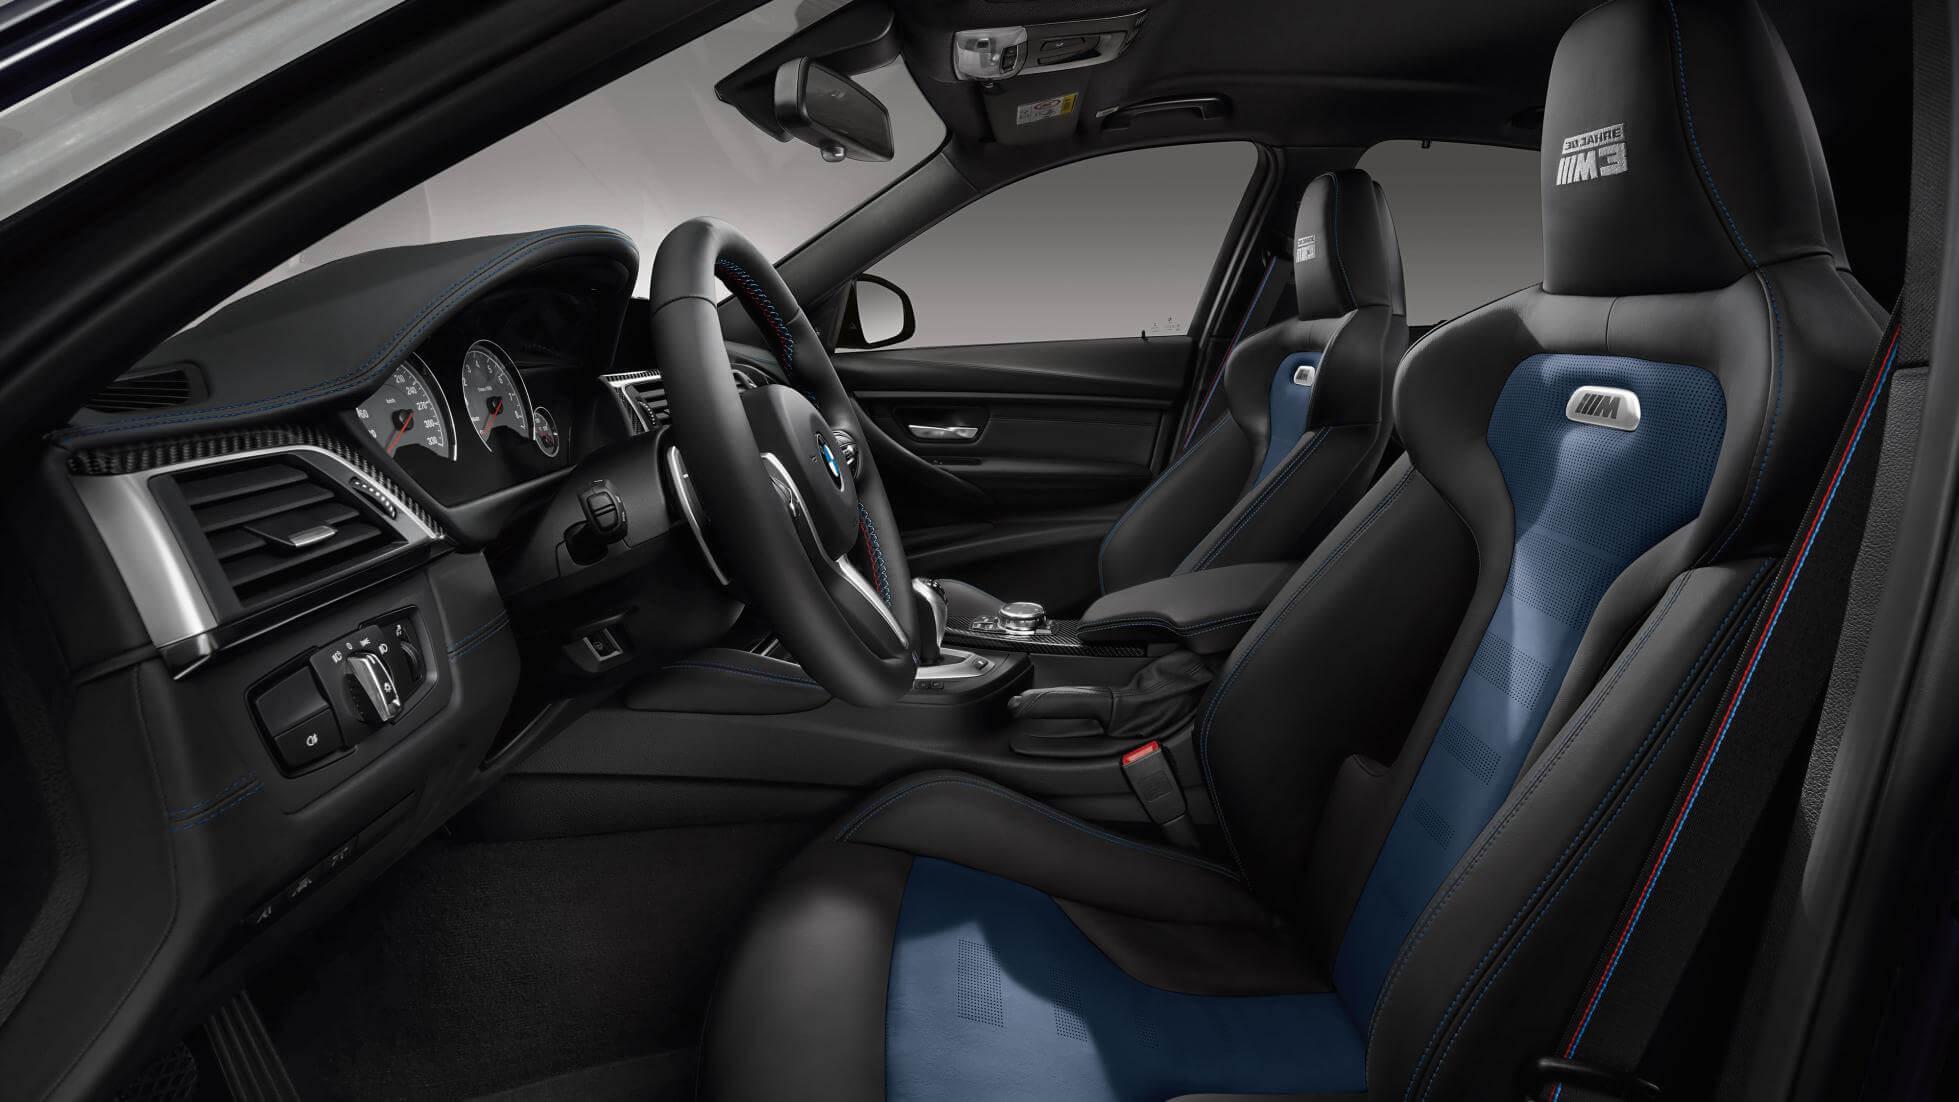 BMW M3 unutrasnjost